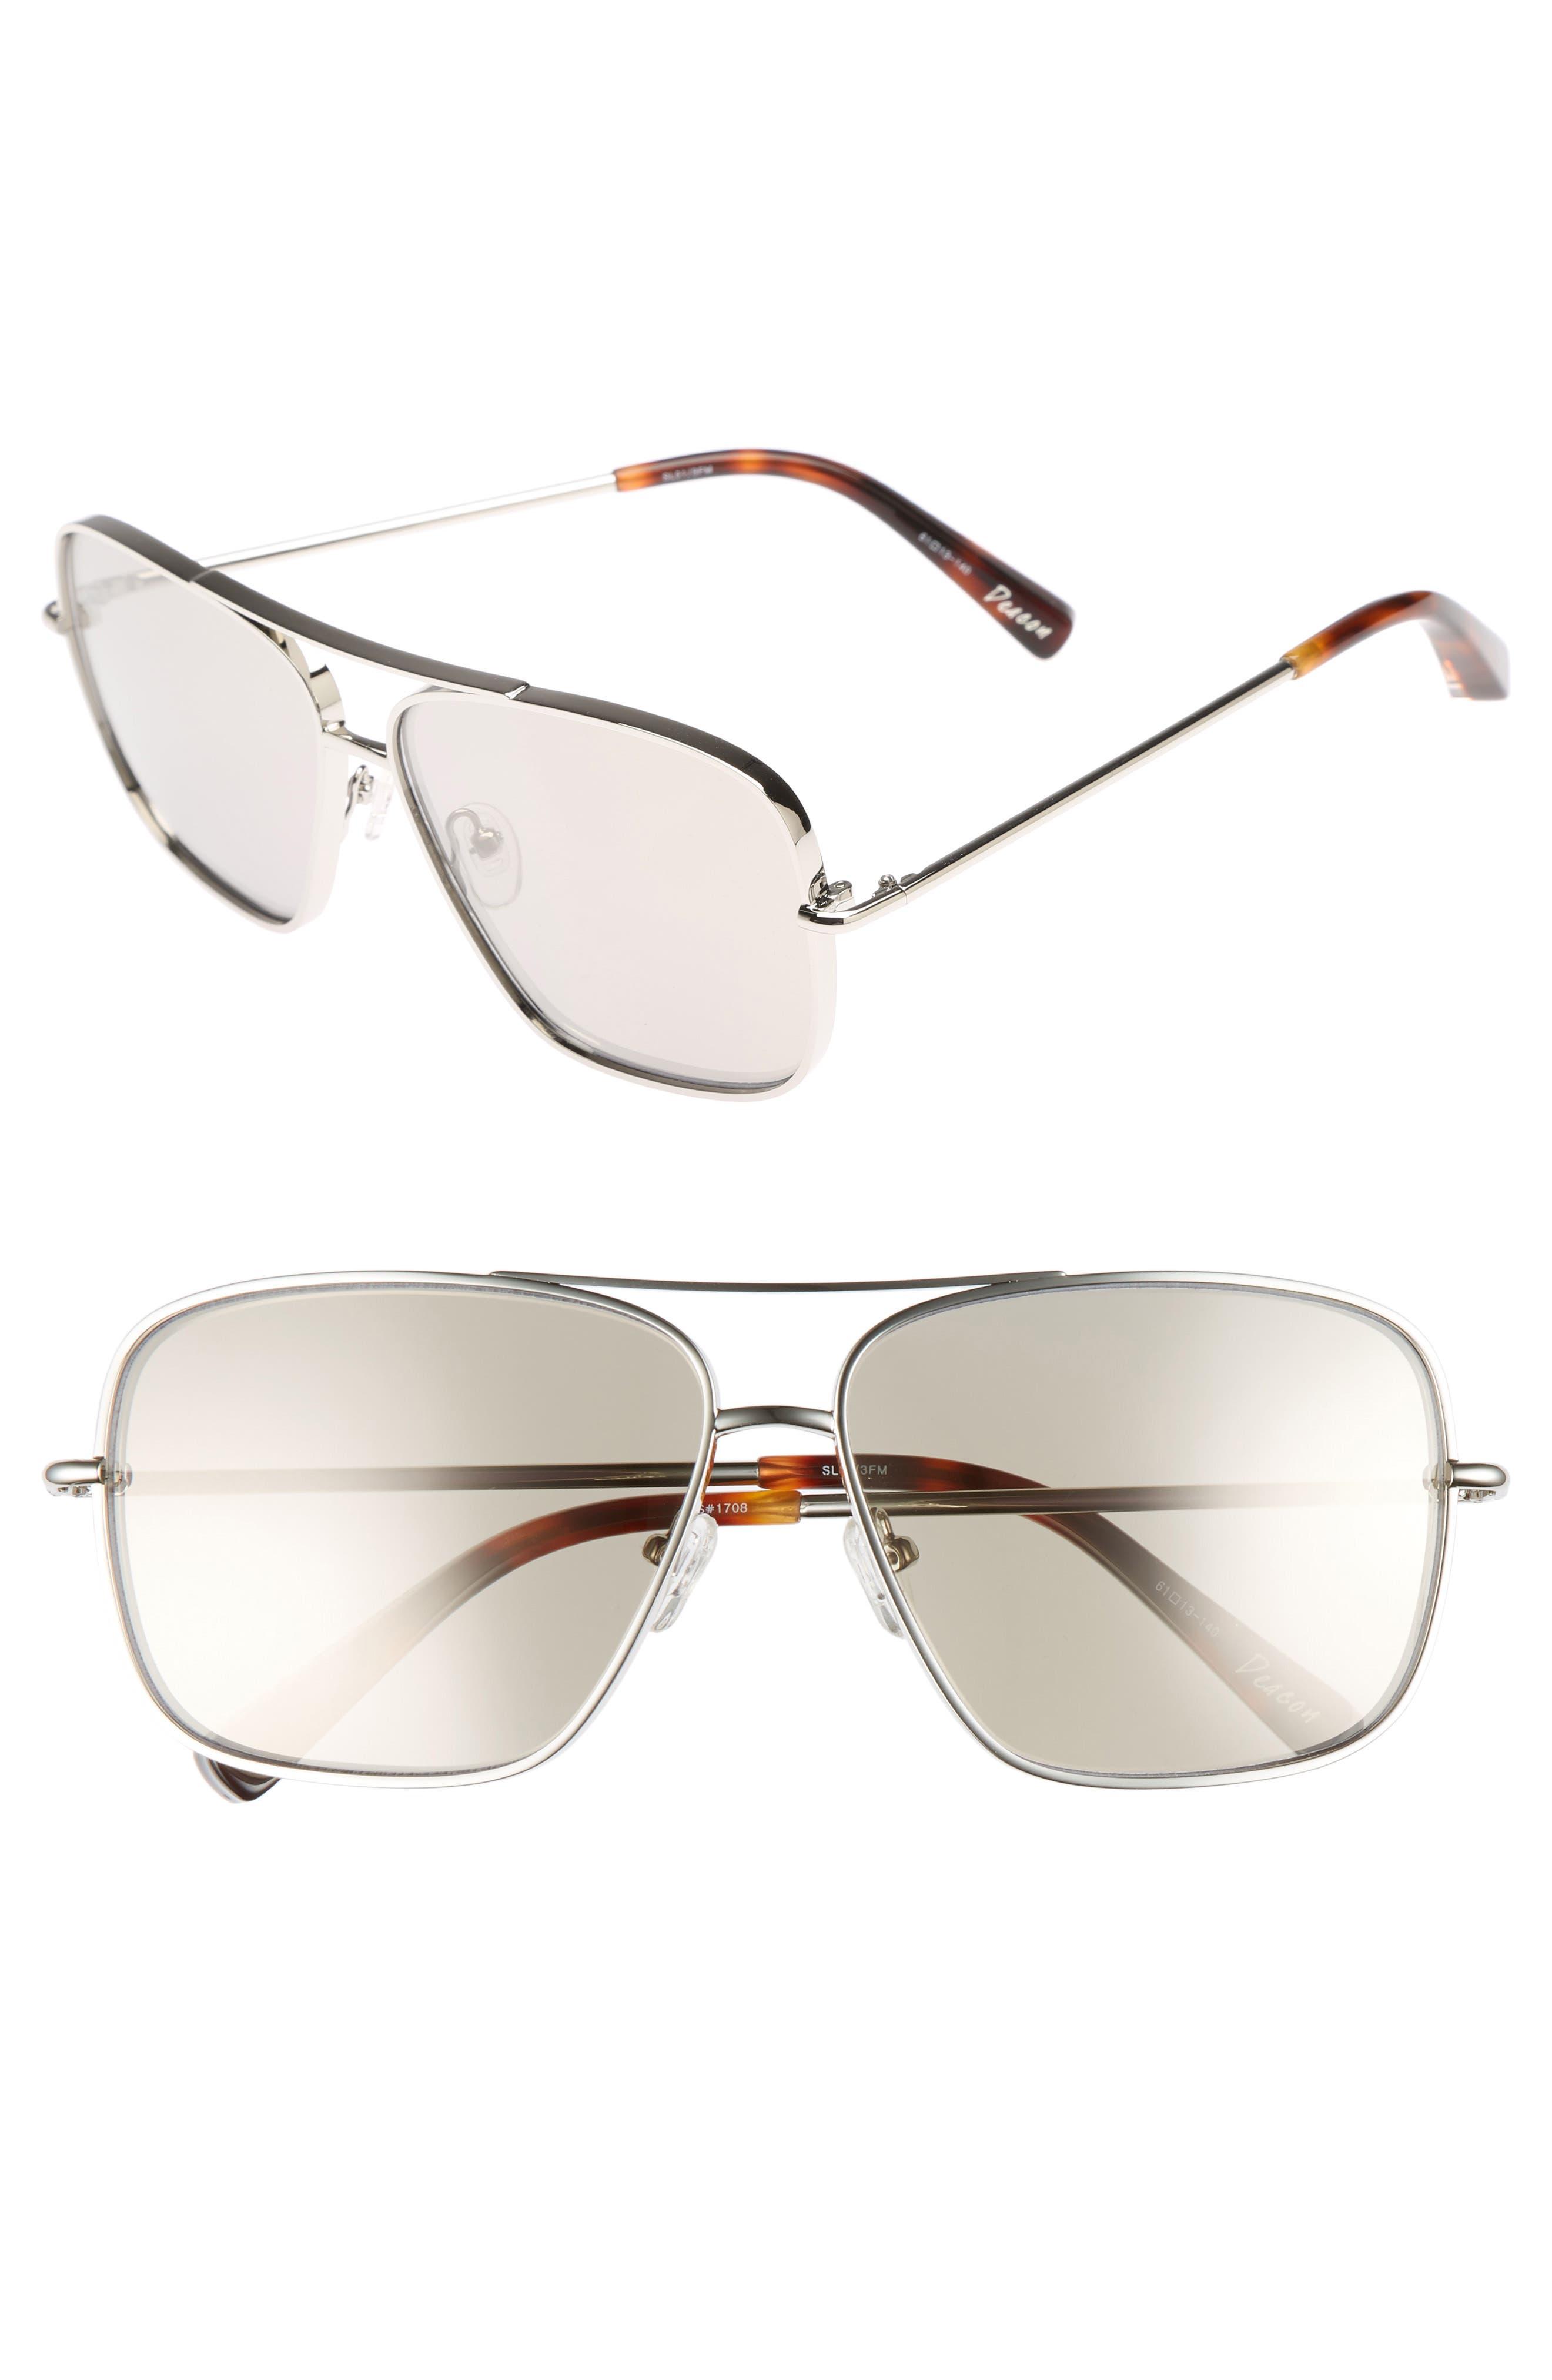 Main Image - Elizabeth and James Deacon 61mm Aviator Sunglasses